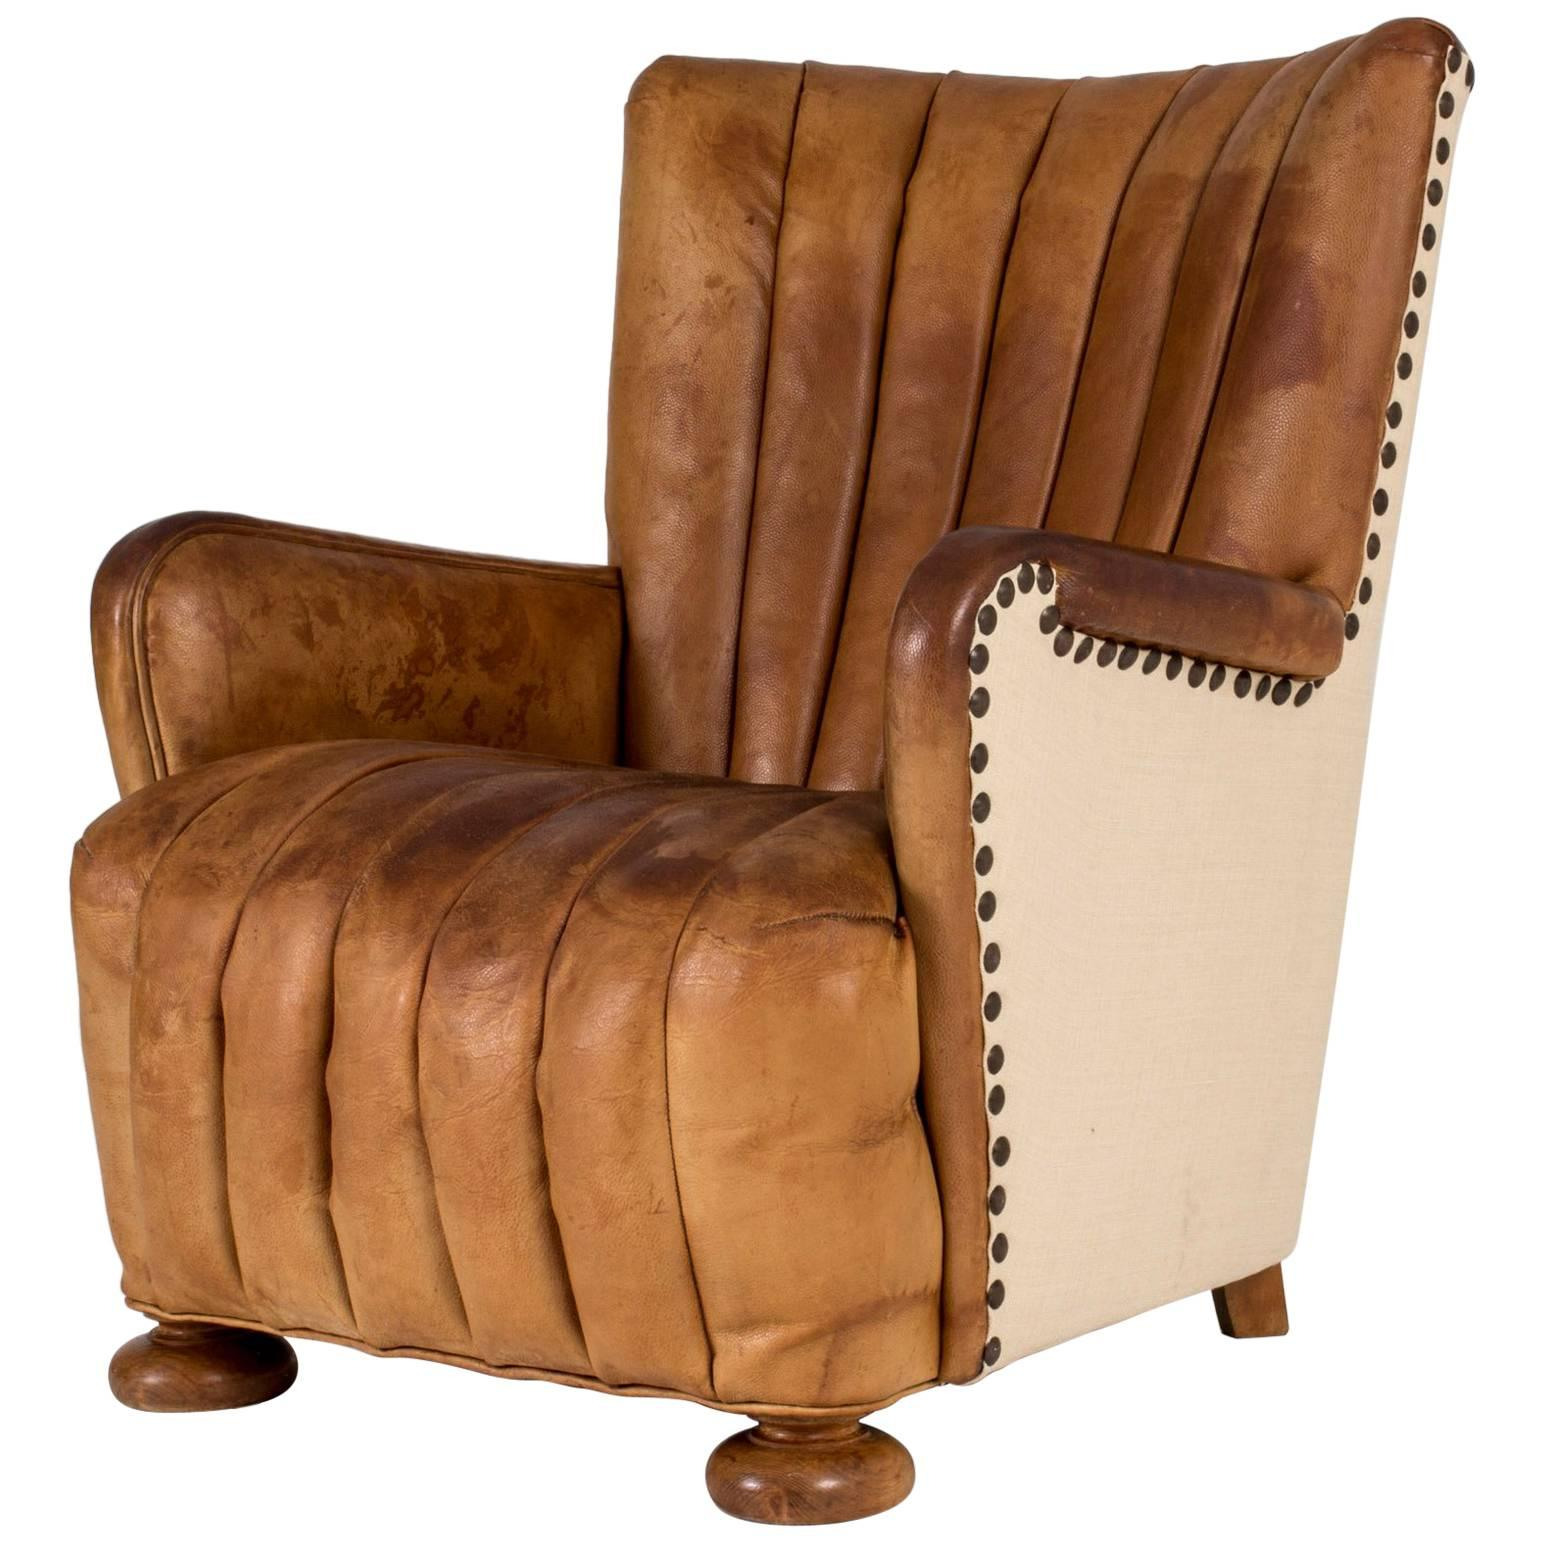 Magnificent Danish 1930S Leather Lounge Chair Frankydiablos Diy Chair Ideas Frankydiabloscom